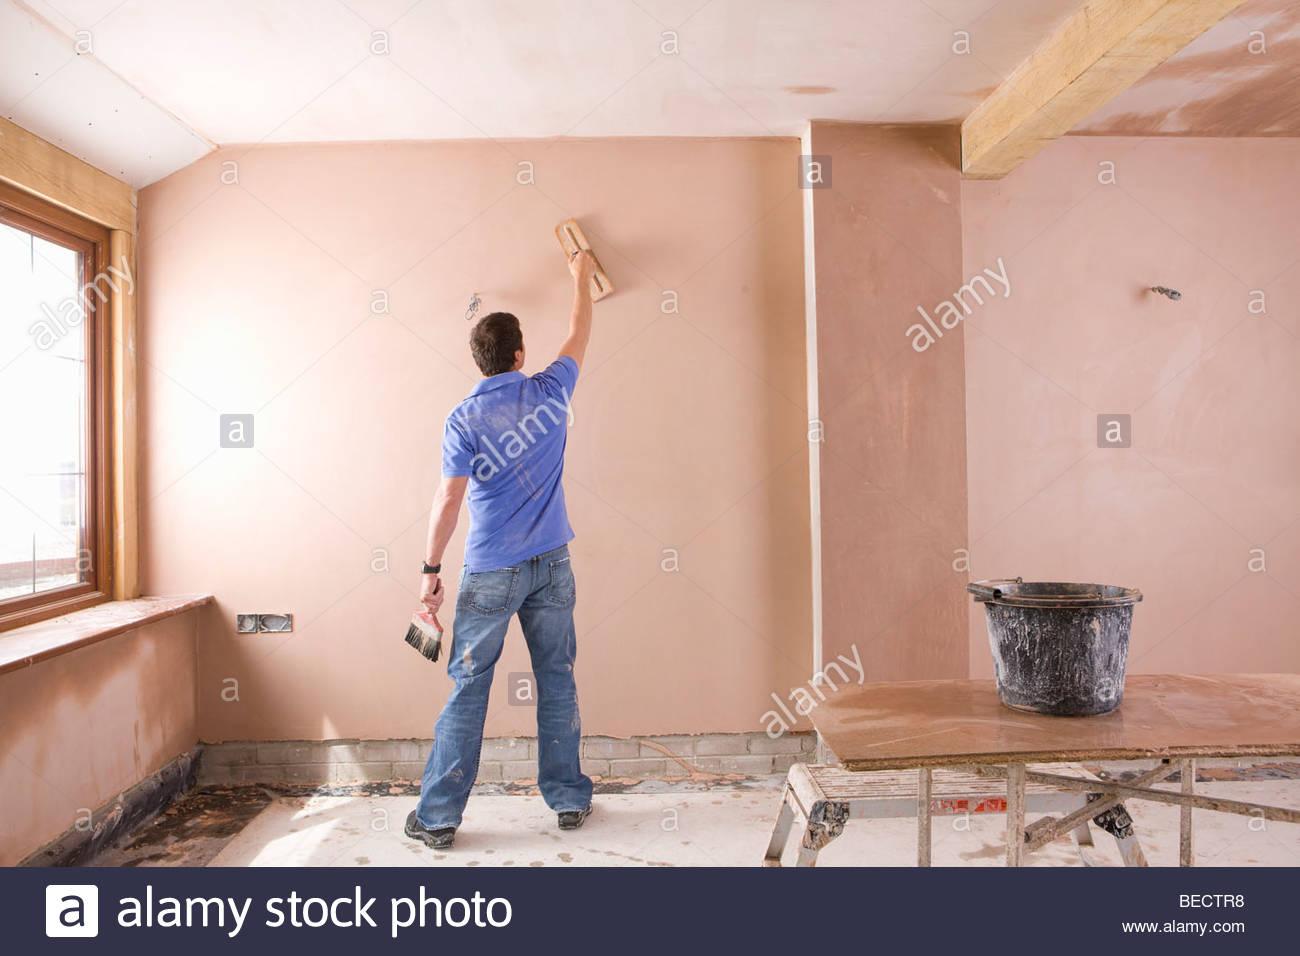 Man Verputzen Wand im Haus im Bau Stockfoto, Bild: 26098444 - Alamy